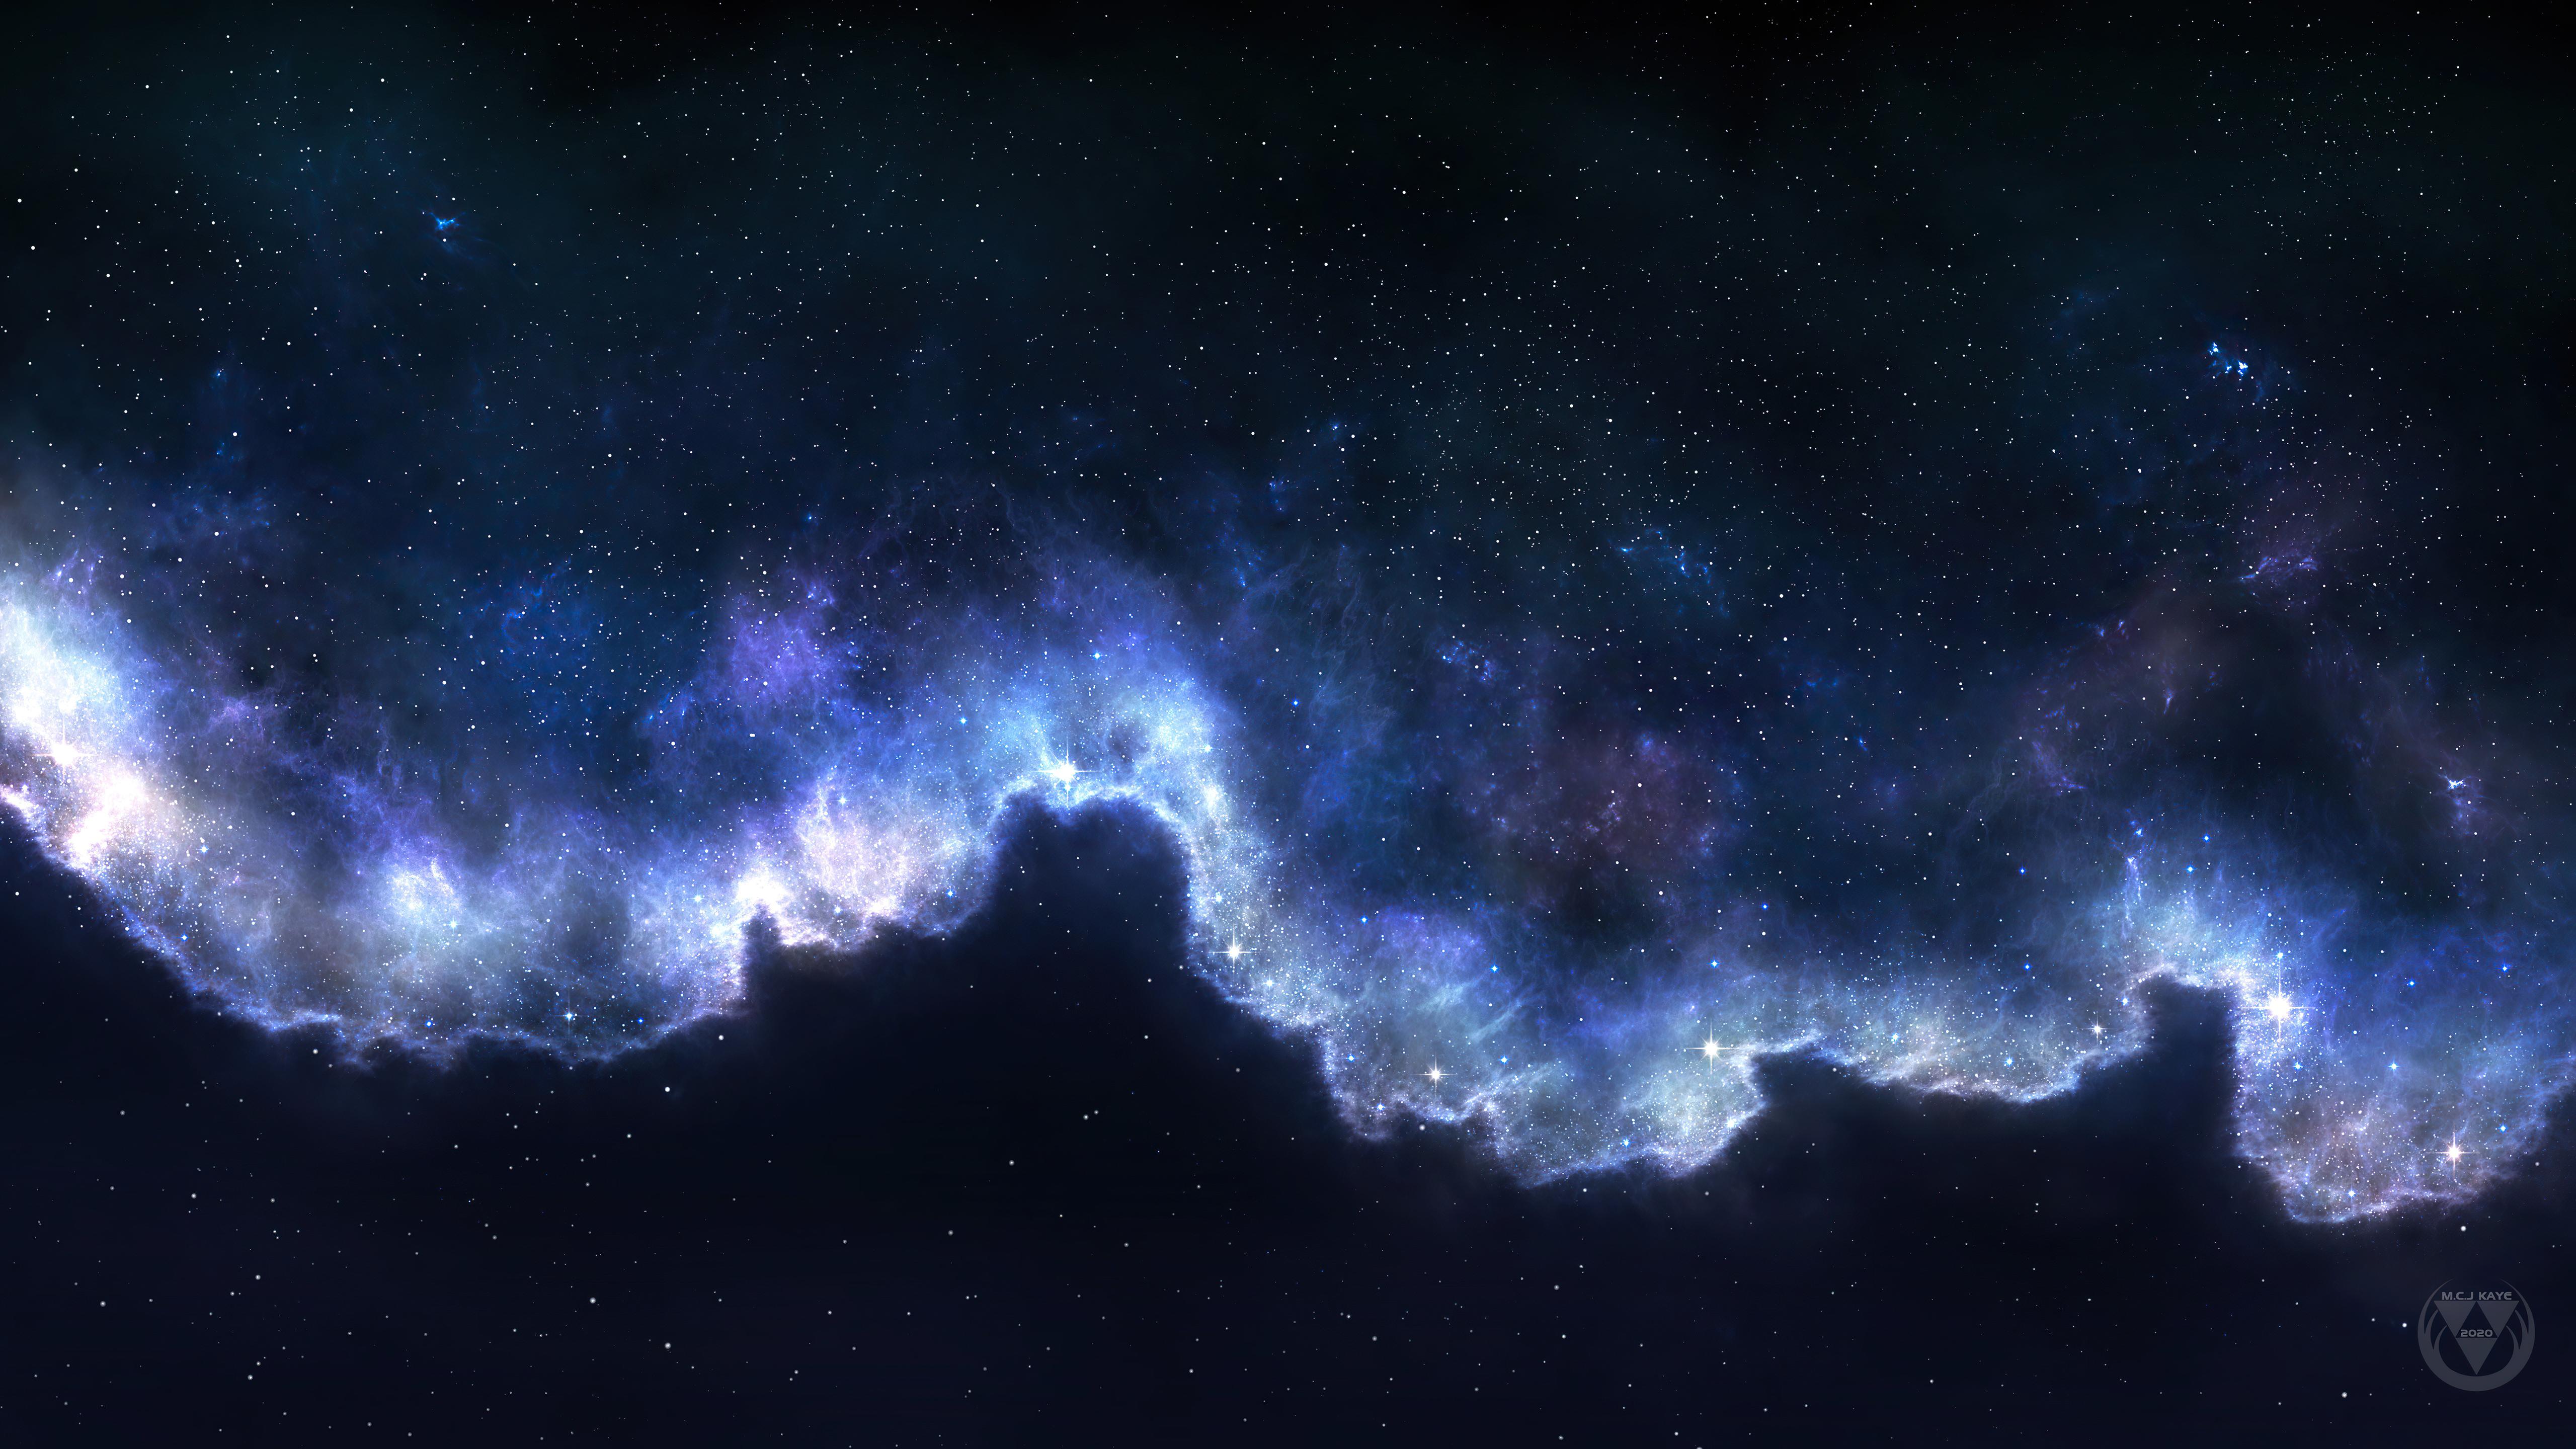 sapphire sky 4k 1618127915 - Sapphire Sky 4k - Sapphire Sky 4k wallpapers